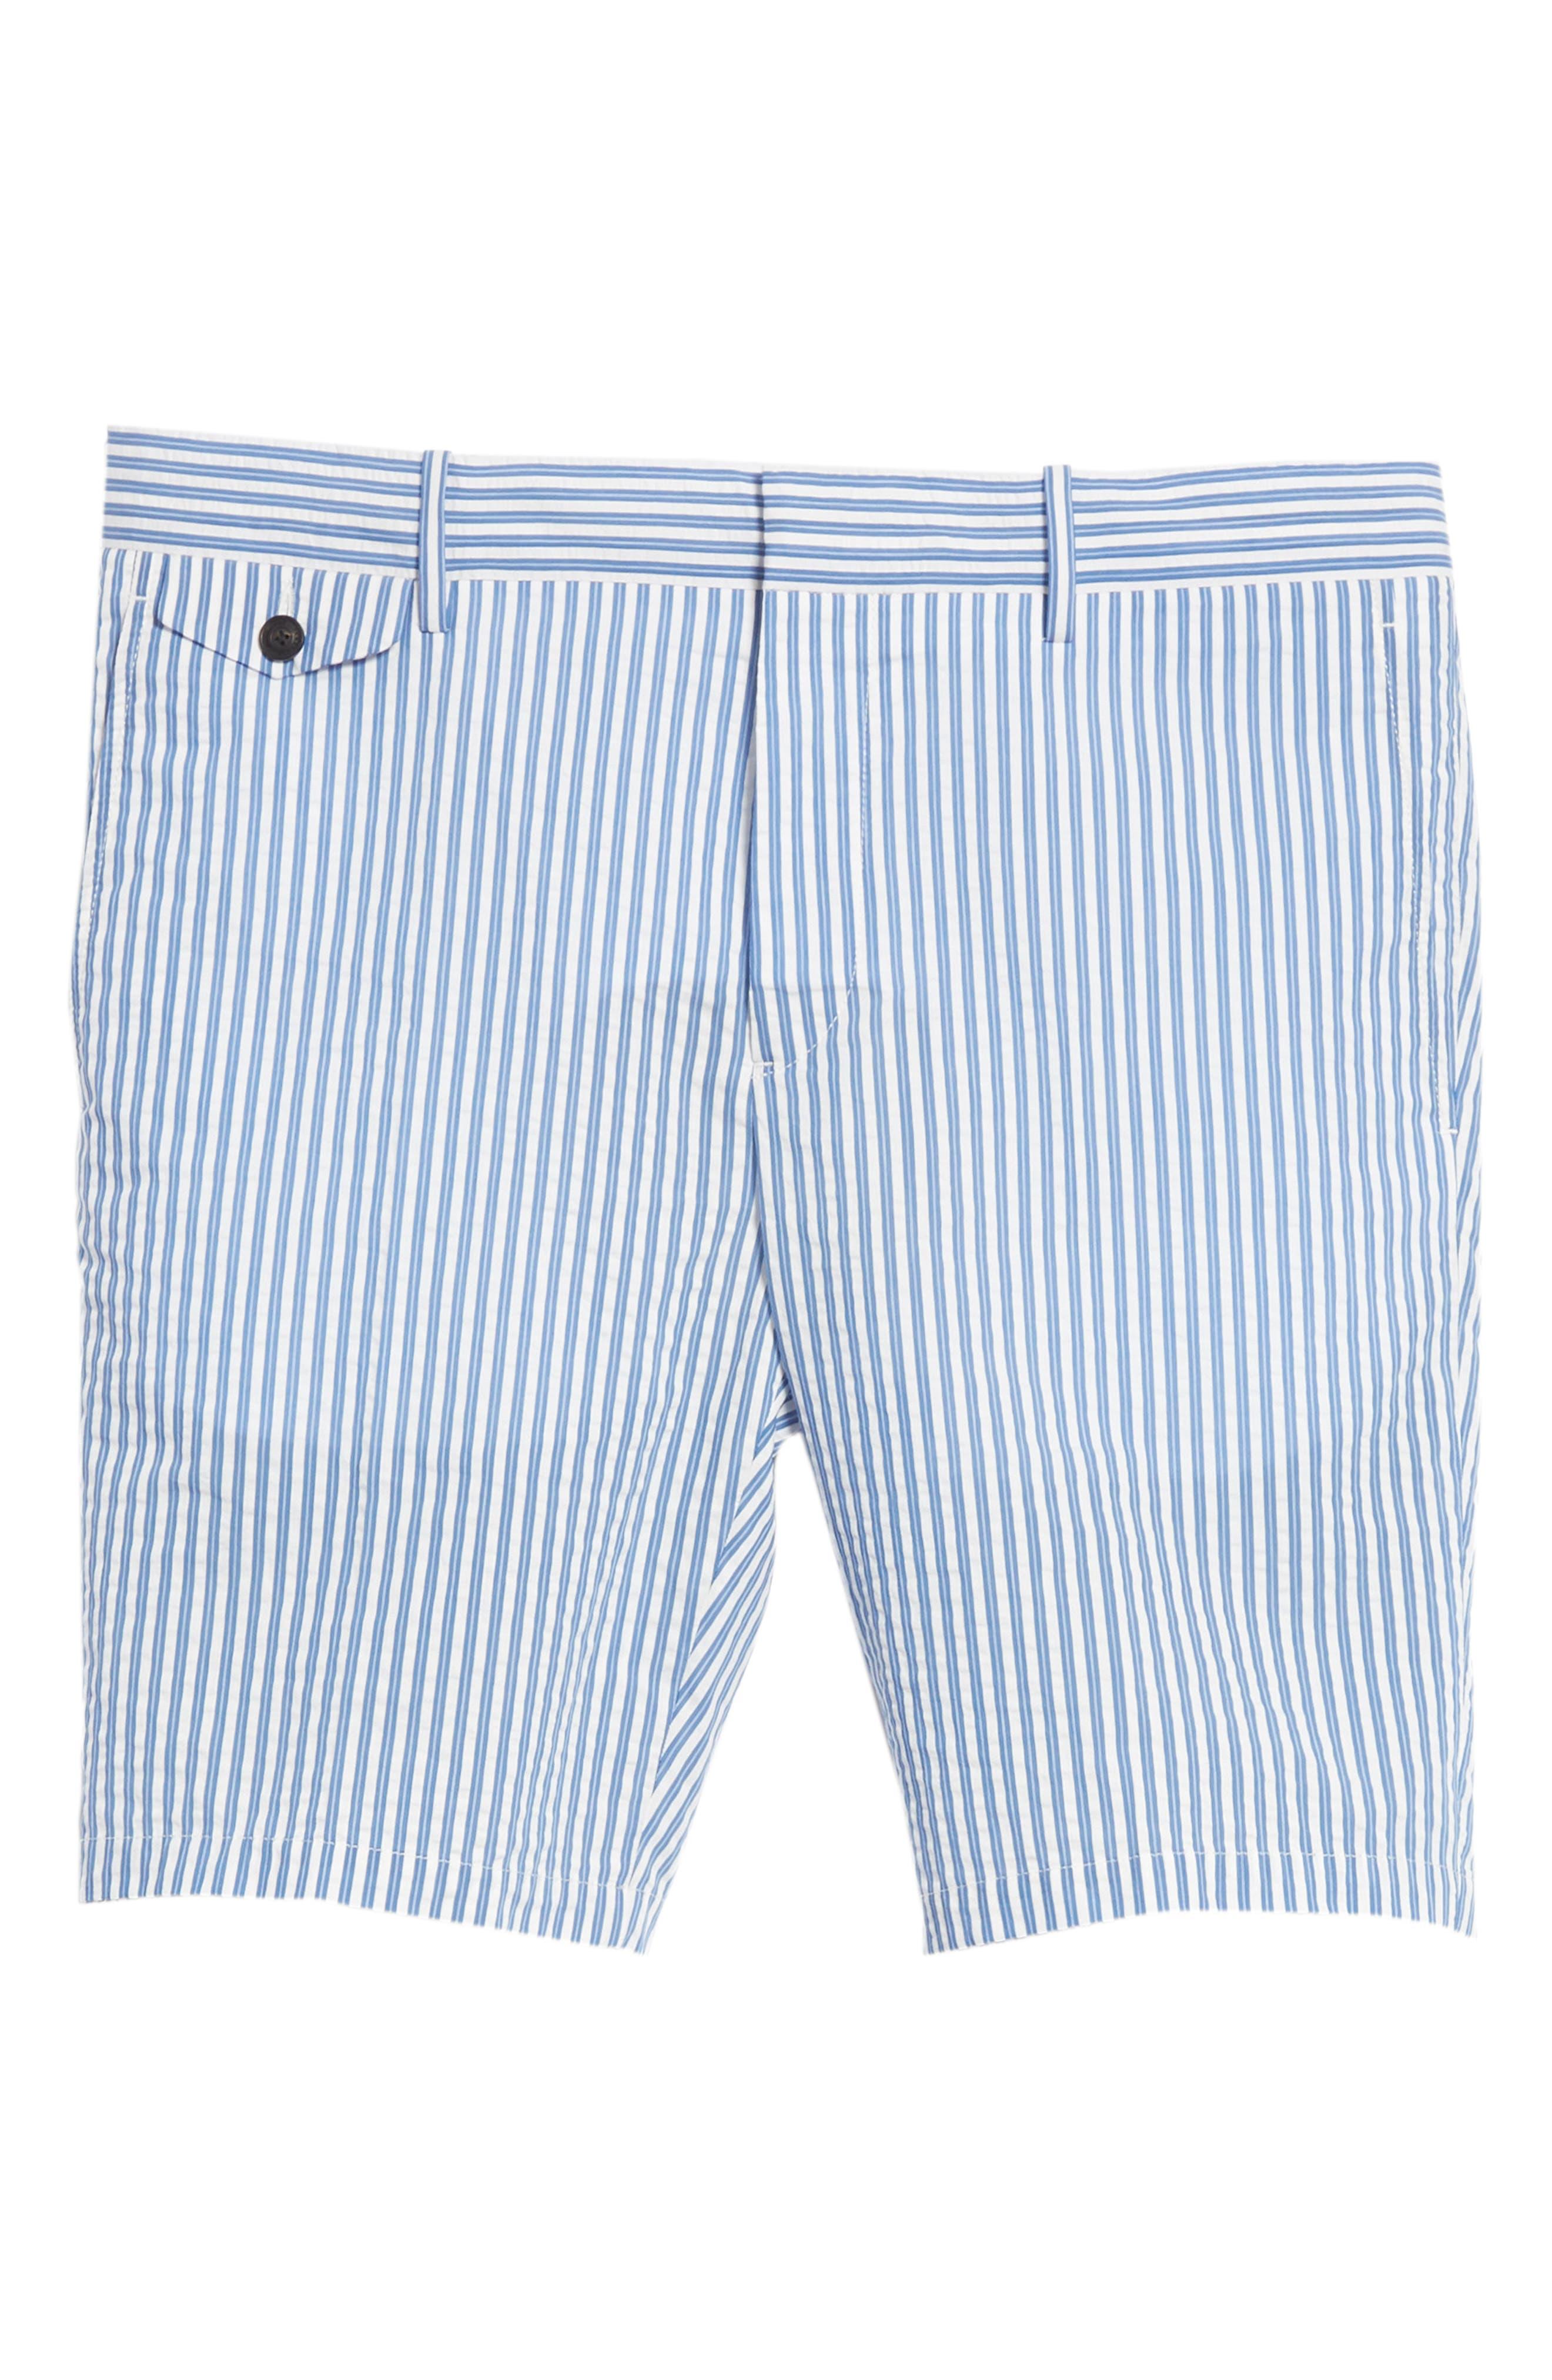 Serpentine Stripe Shorts,                             Alternate thumbnail 6, color,